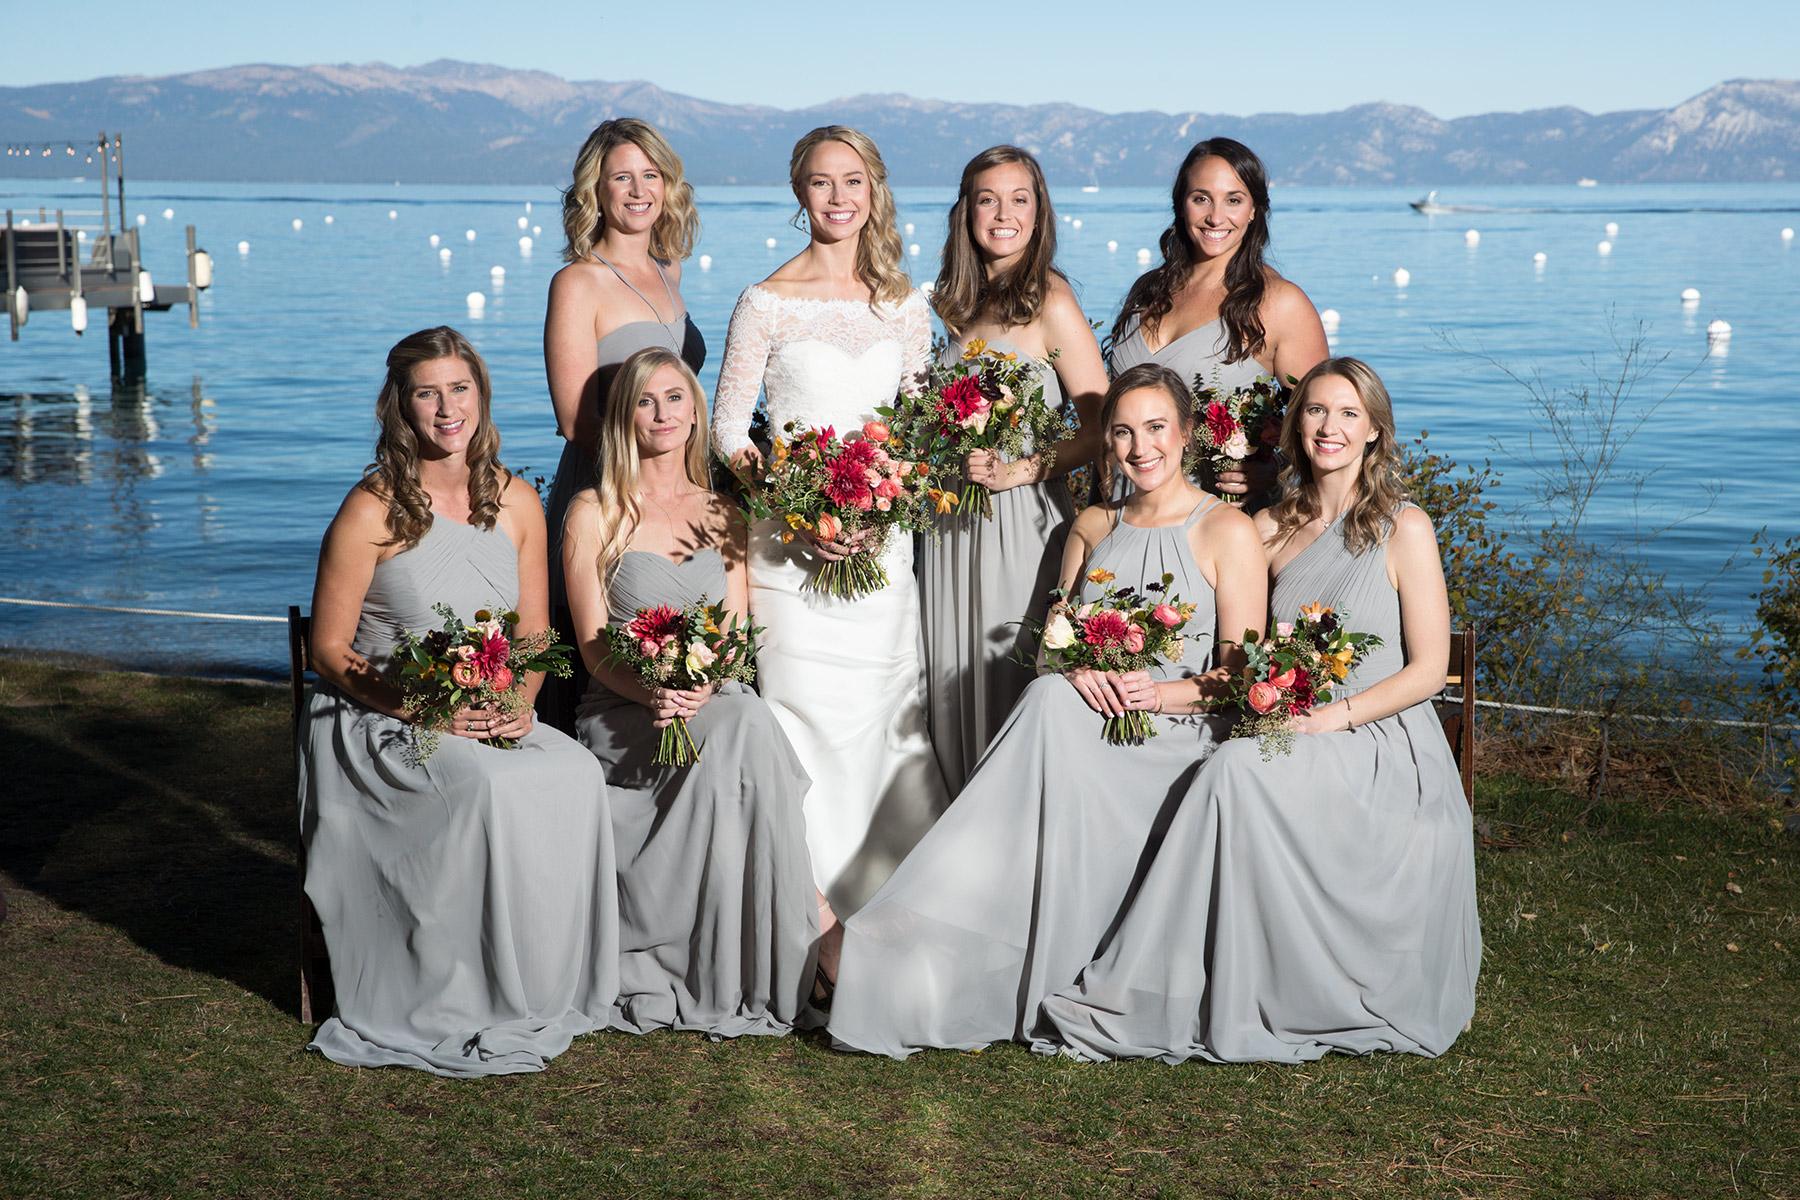 group-shot-wedding-Tahoe-bride-and-bridesmaids